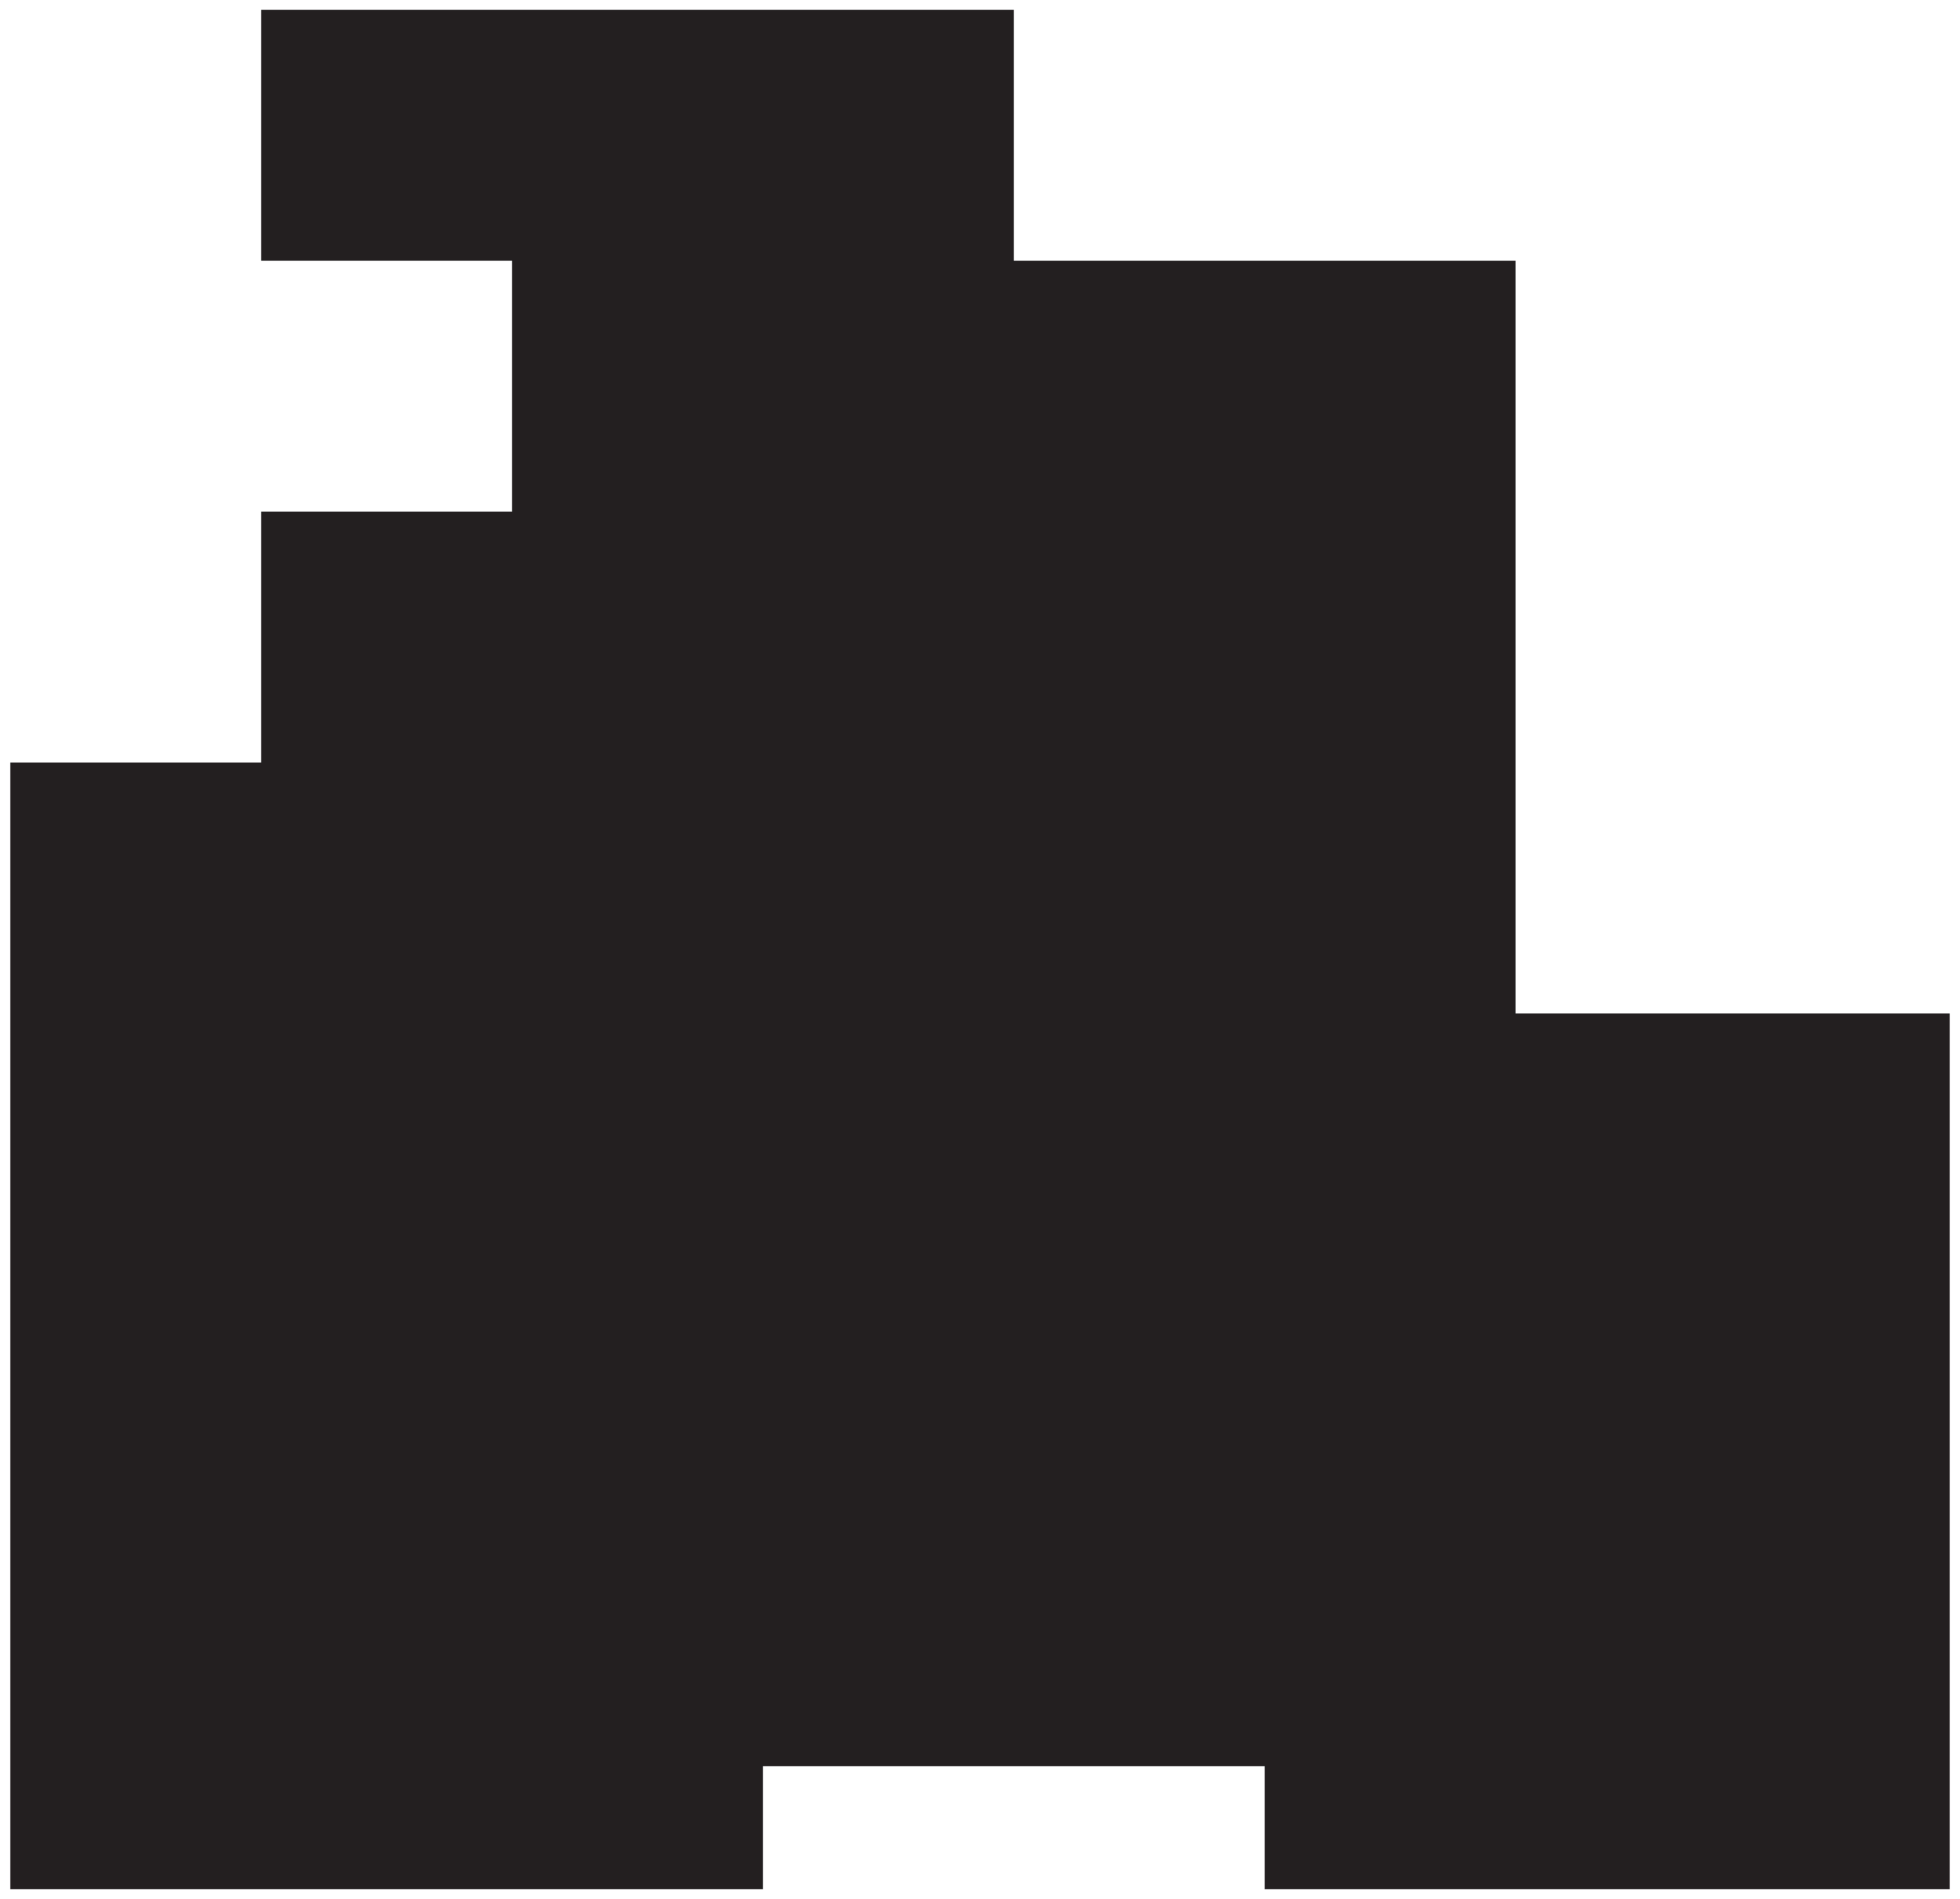 Cycling racing bicycle wheels. Wheel clipart cycle wheel